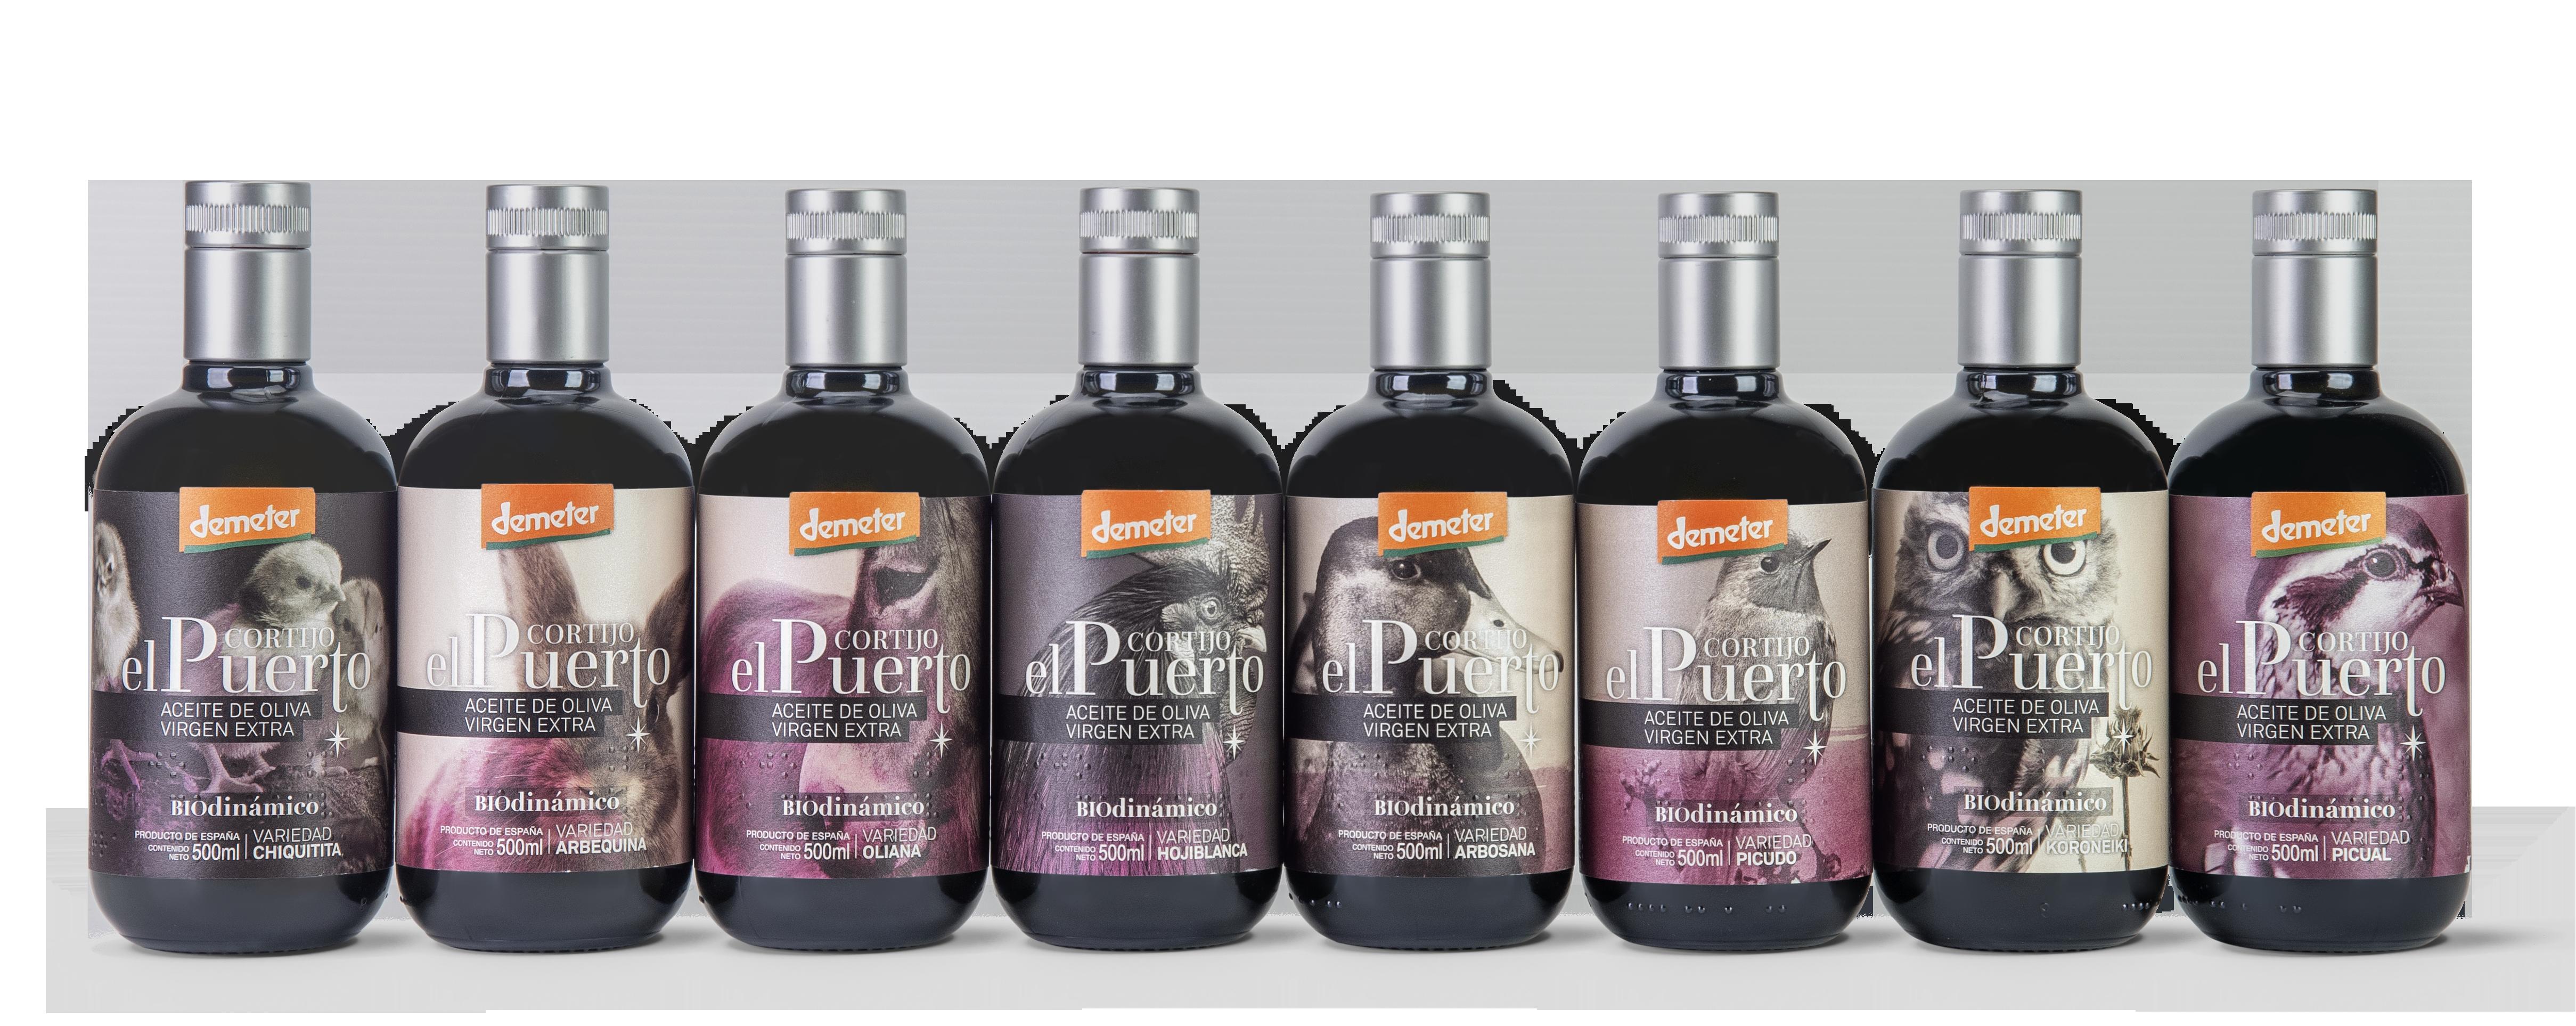 organic-biodynamic-extra-virgin-olive-oil-cortijo-el-puerto